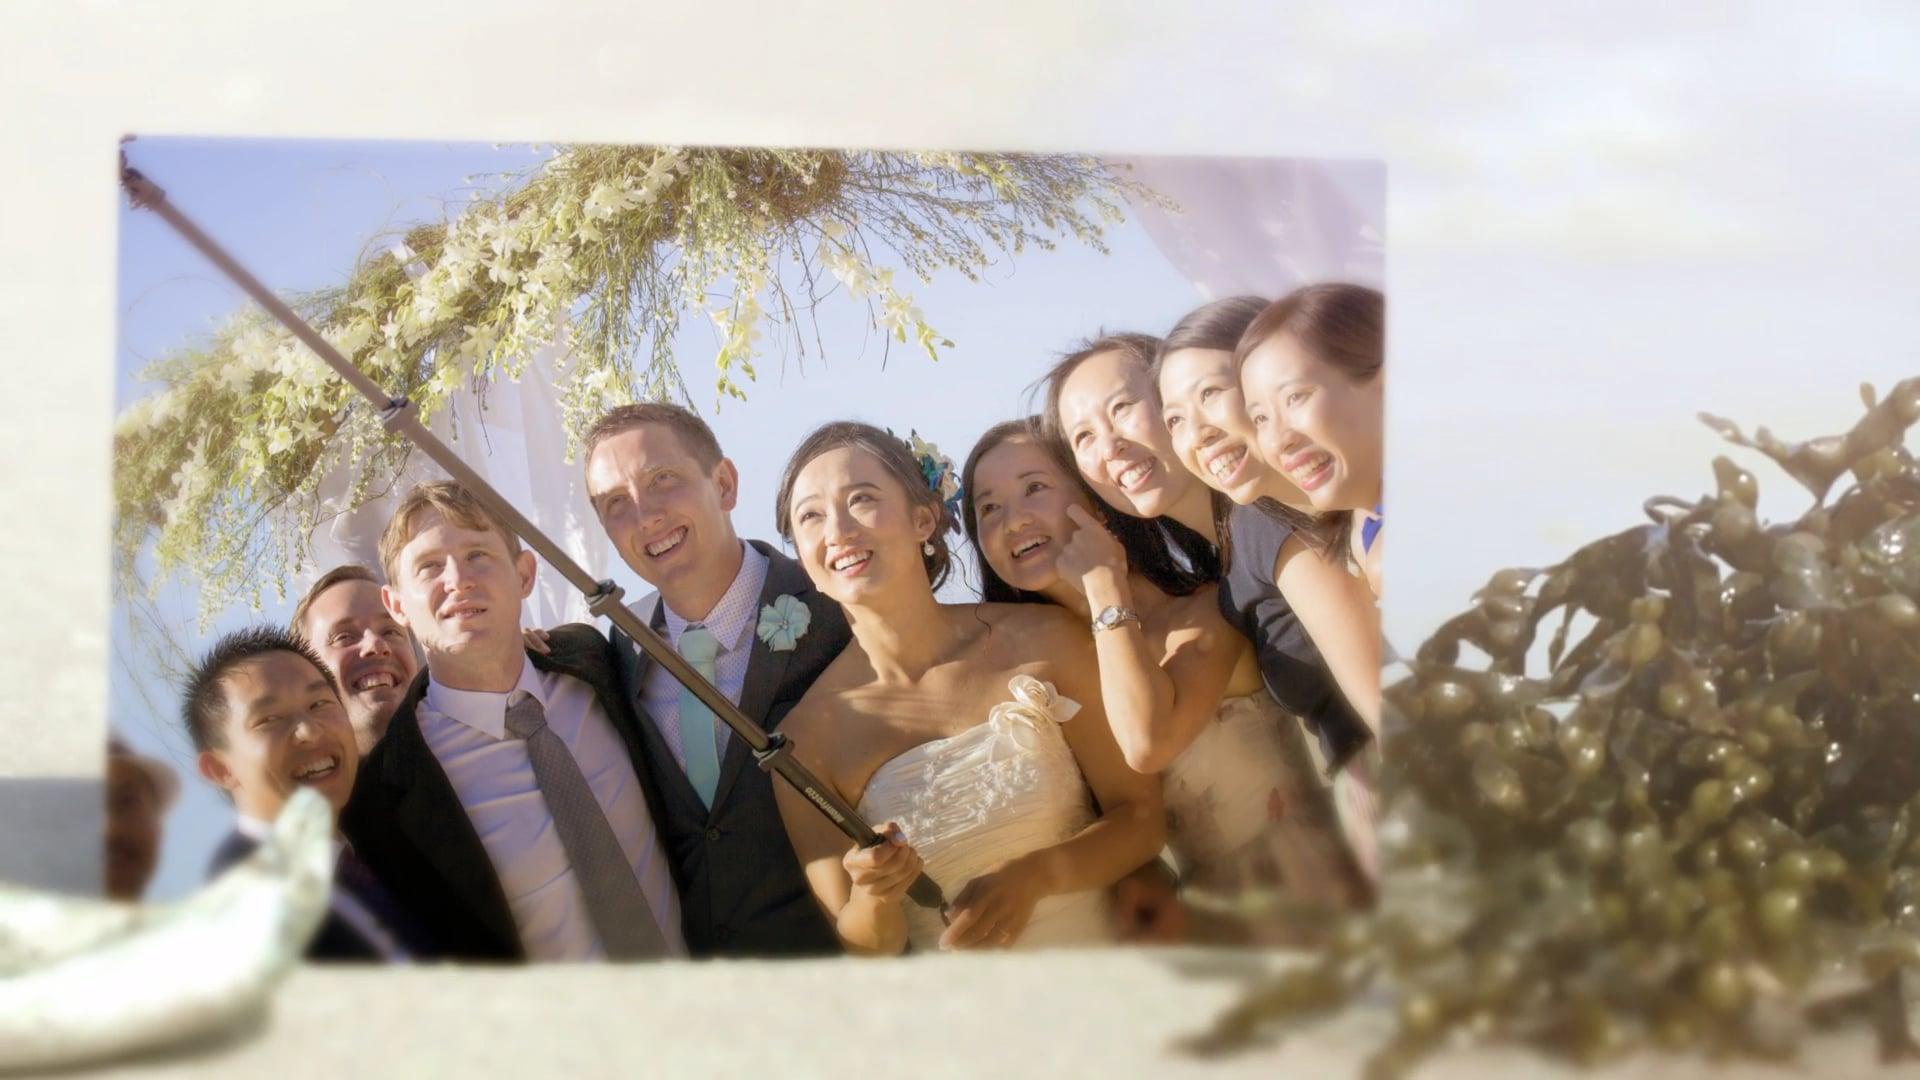 Amy and Tony's Wedding Photo Slide Show